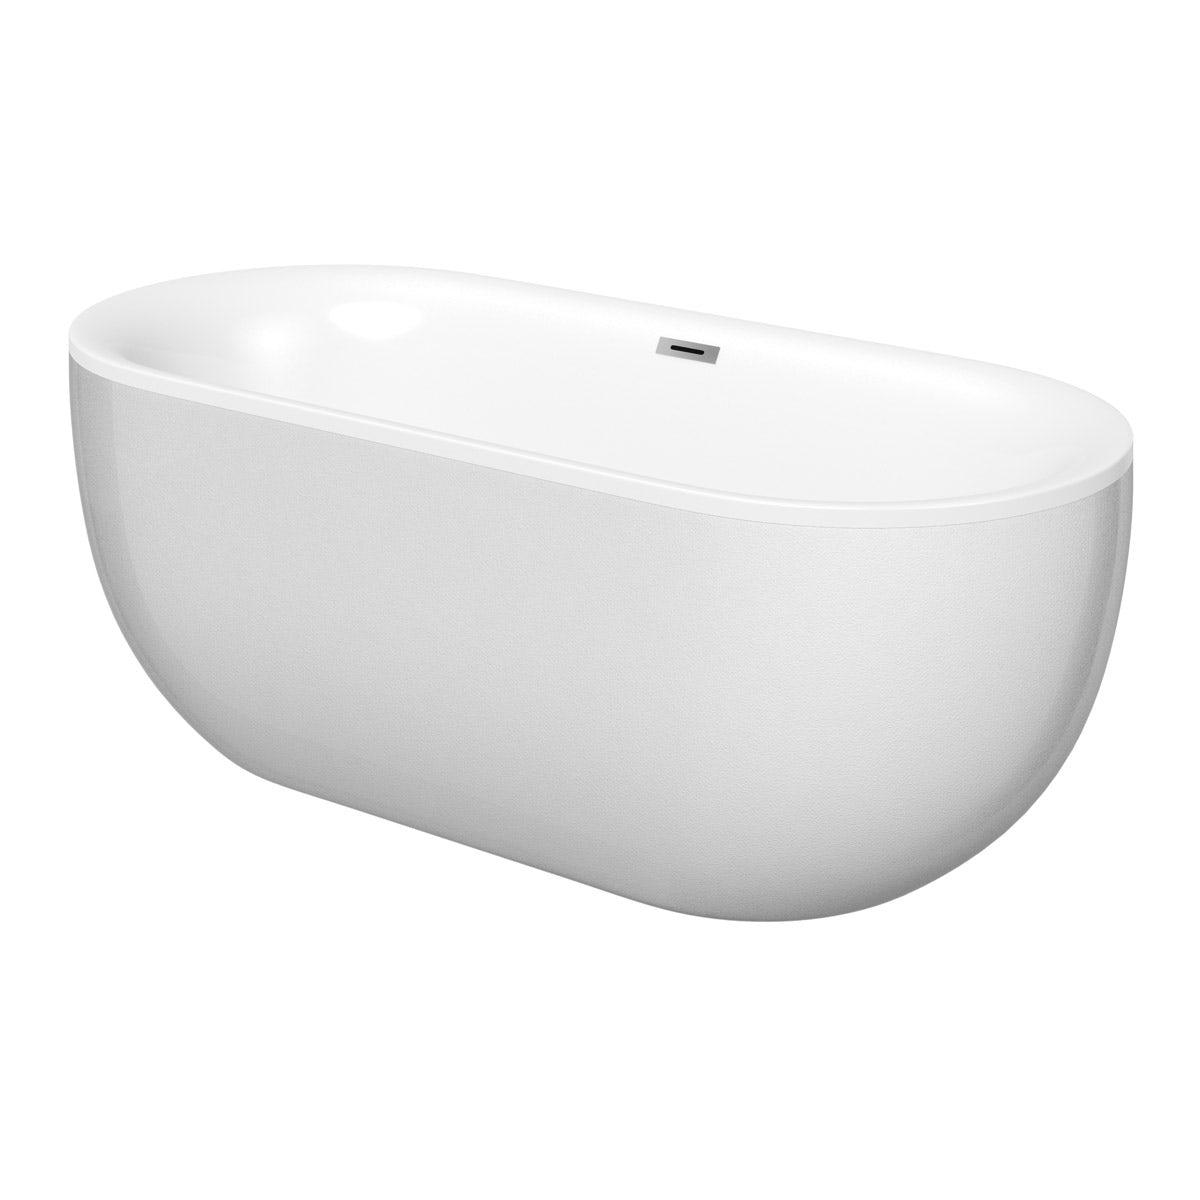 Mode Ellis pearl coloured freestanding bath offer pack